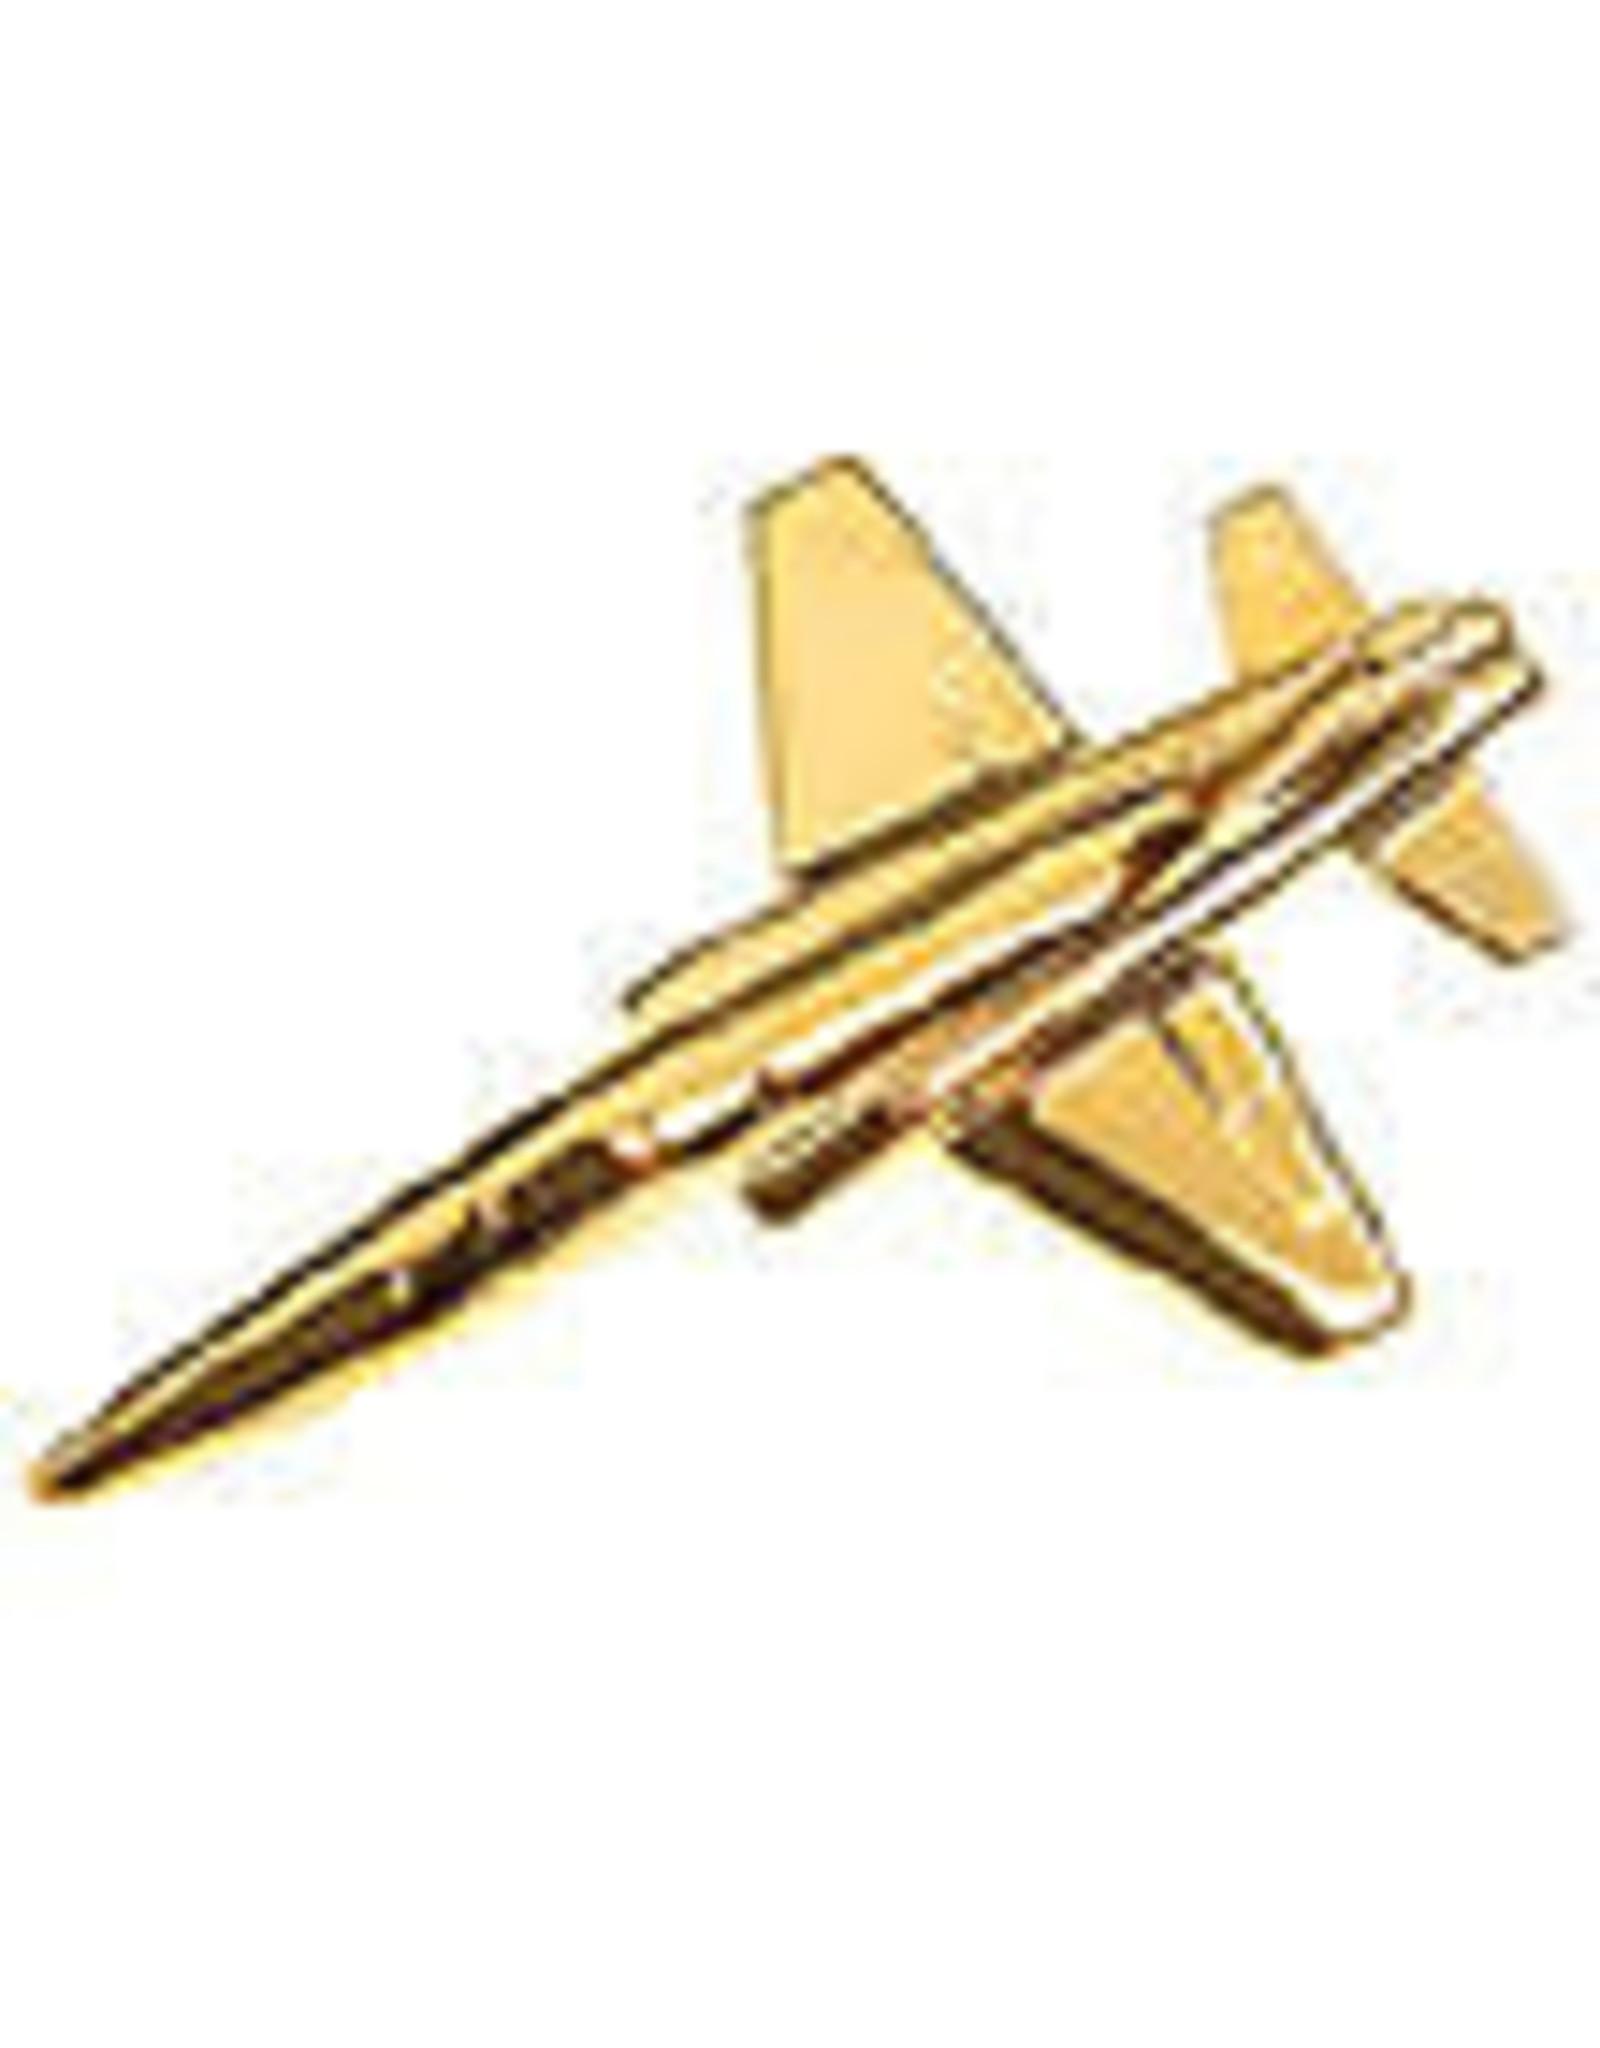 Clivedon Pin Badge T-38 Talon, Pin, gold